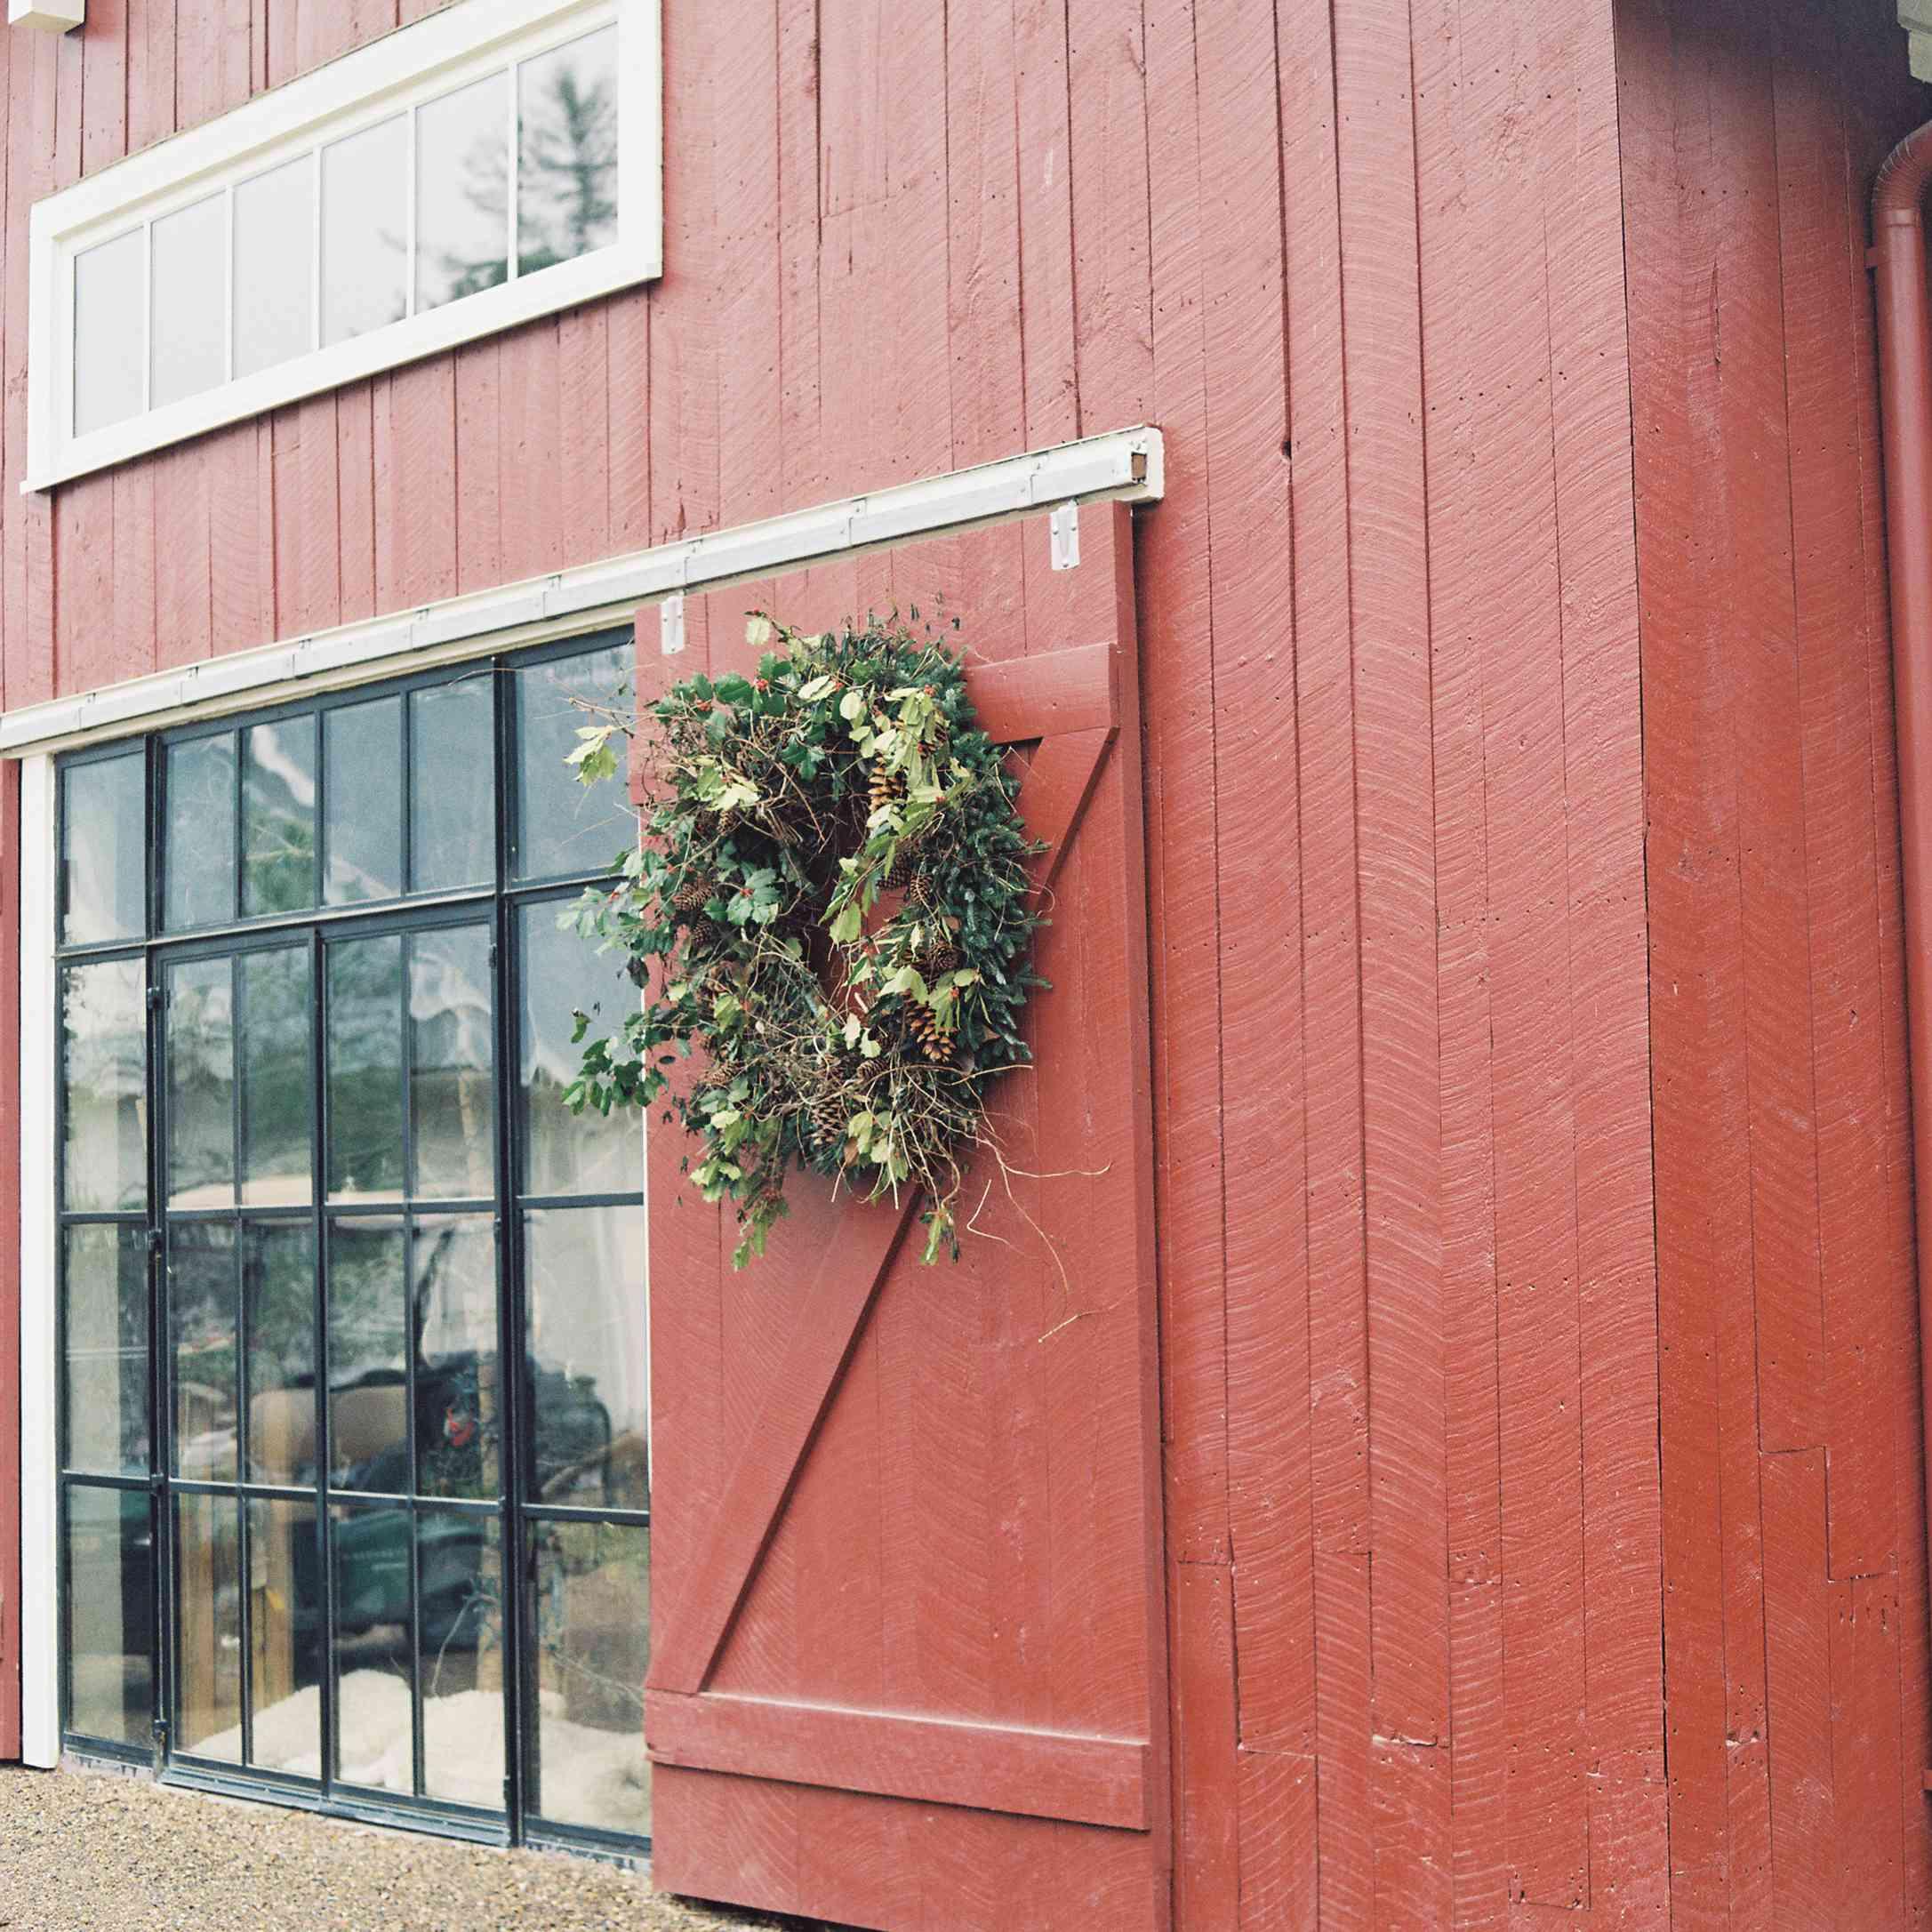 Red barn venue with seasonal greenery